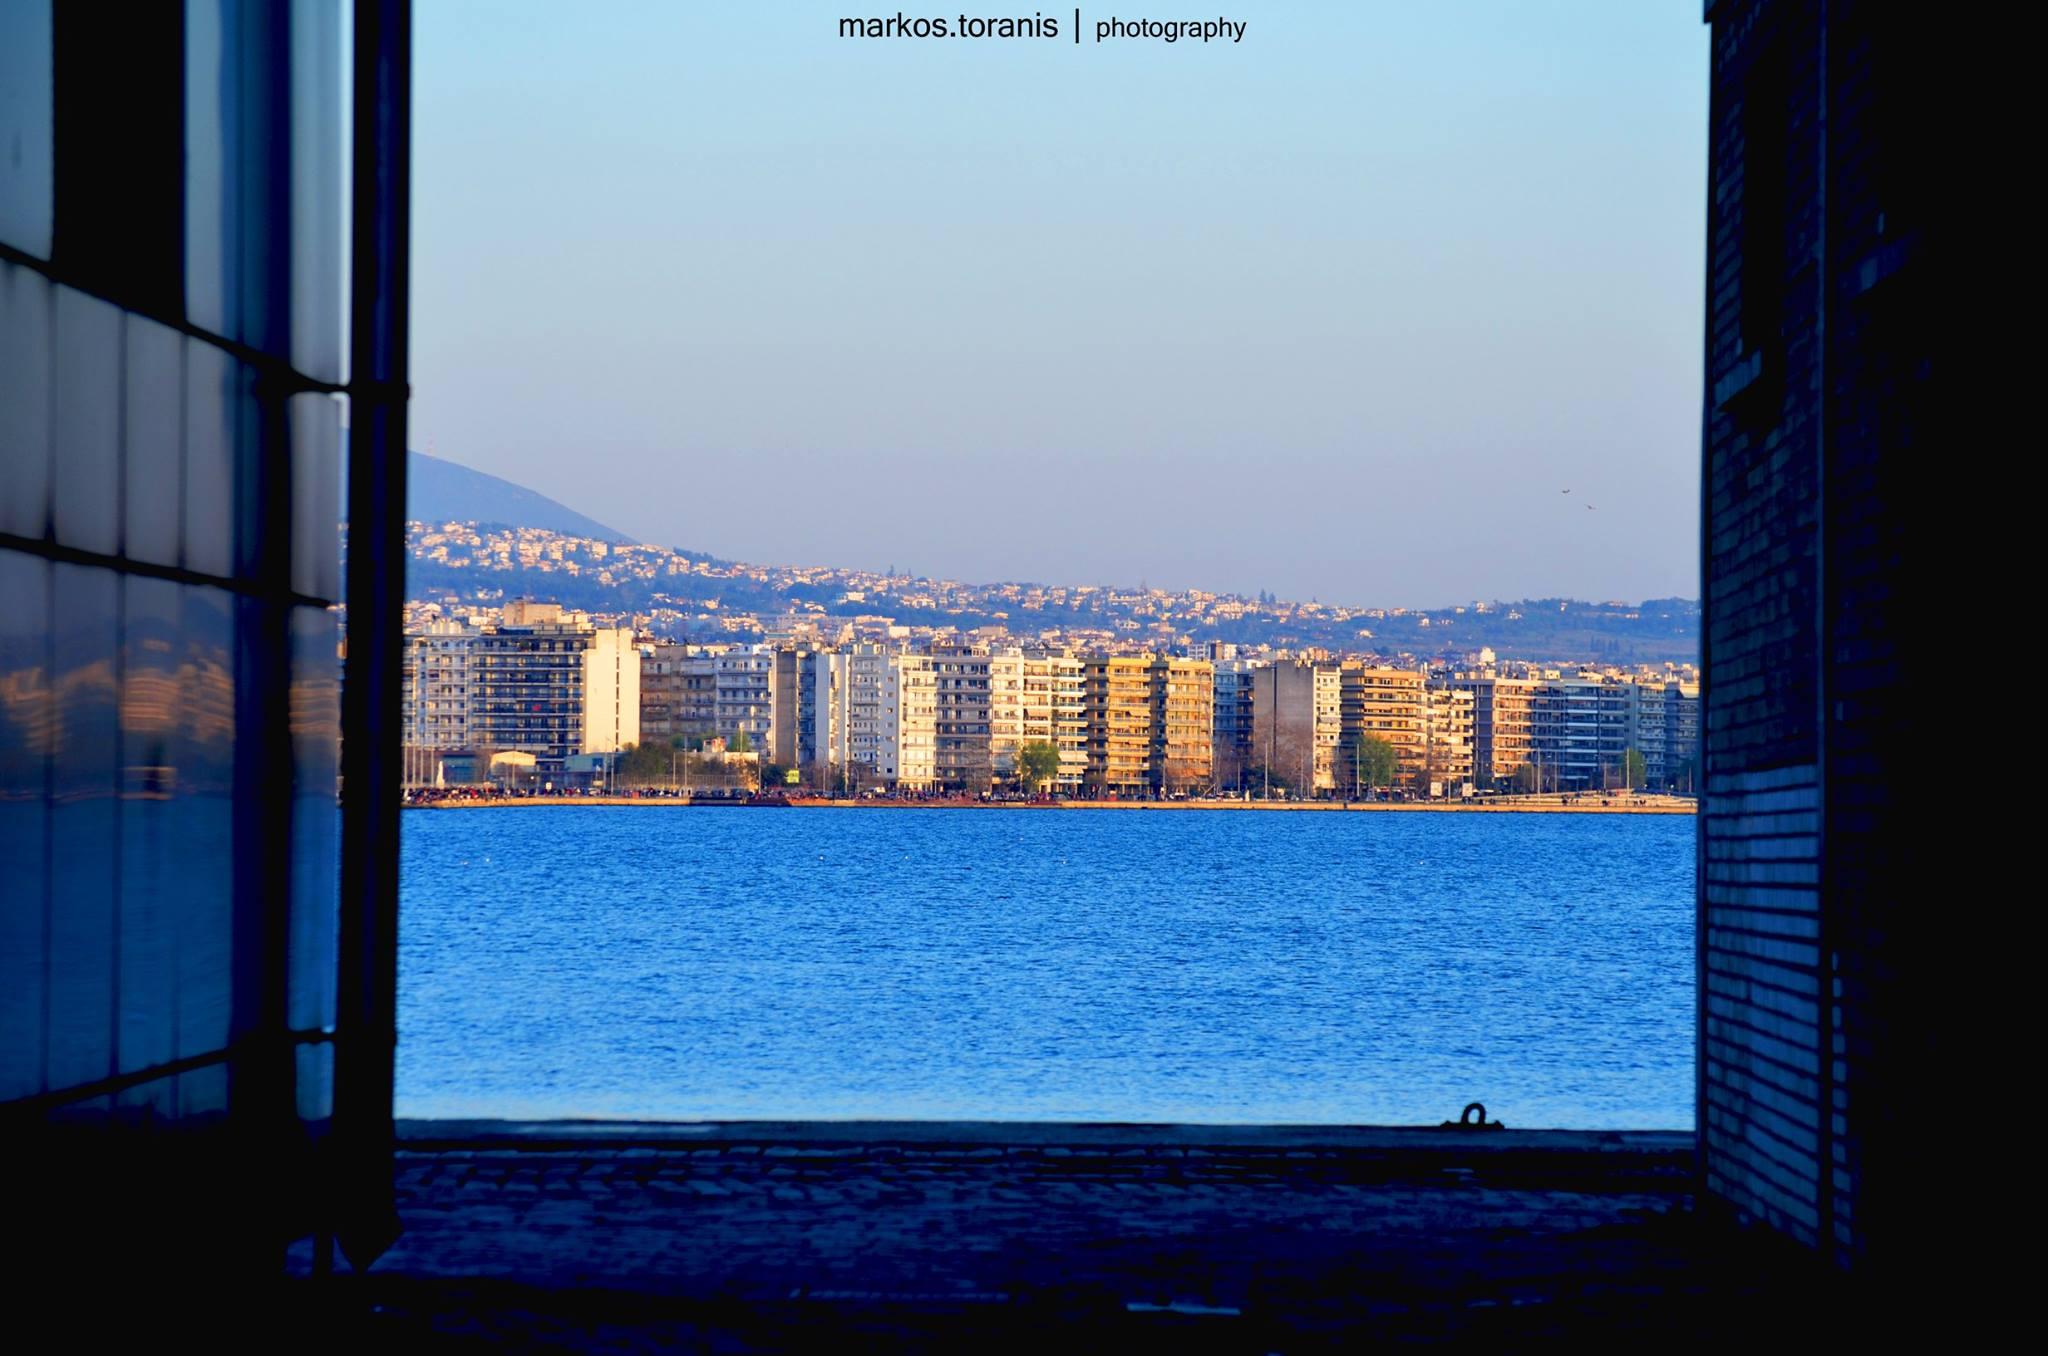 markos-toranis-365-1